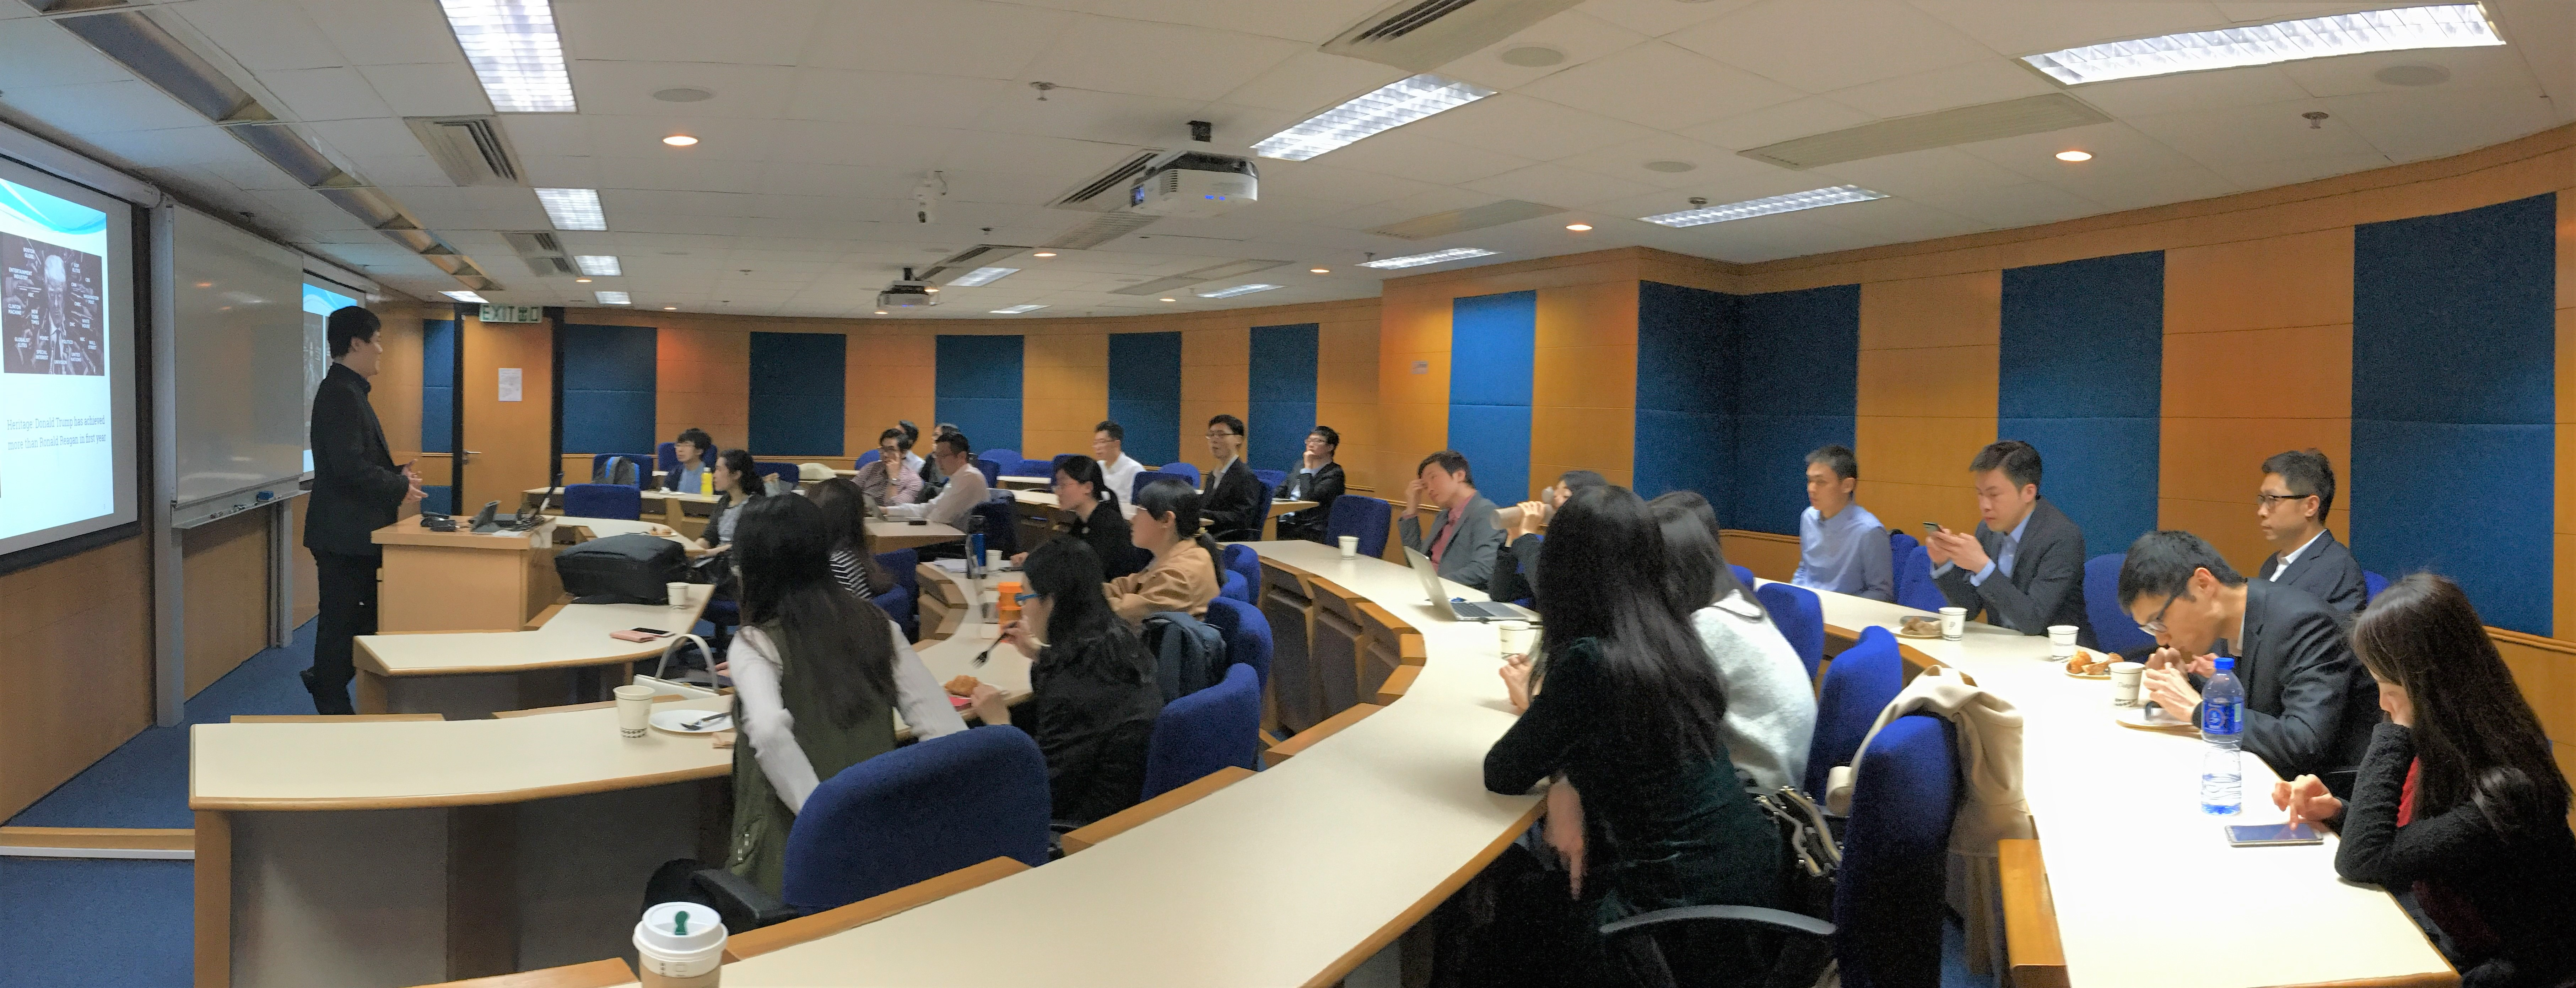 Professional Seminar by Tristan Zhuo 2